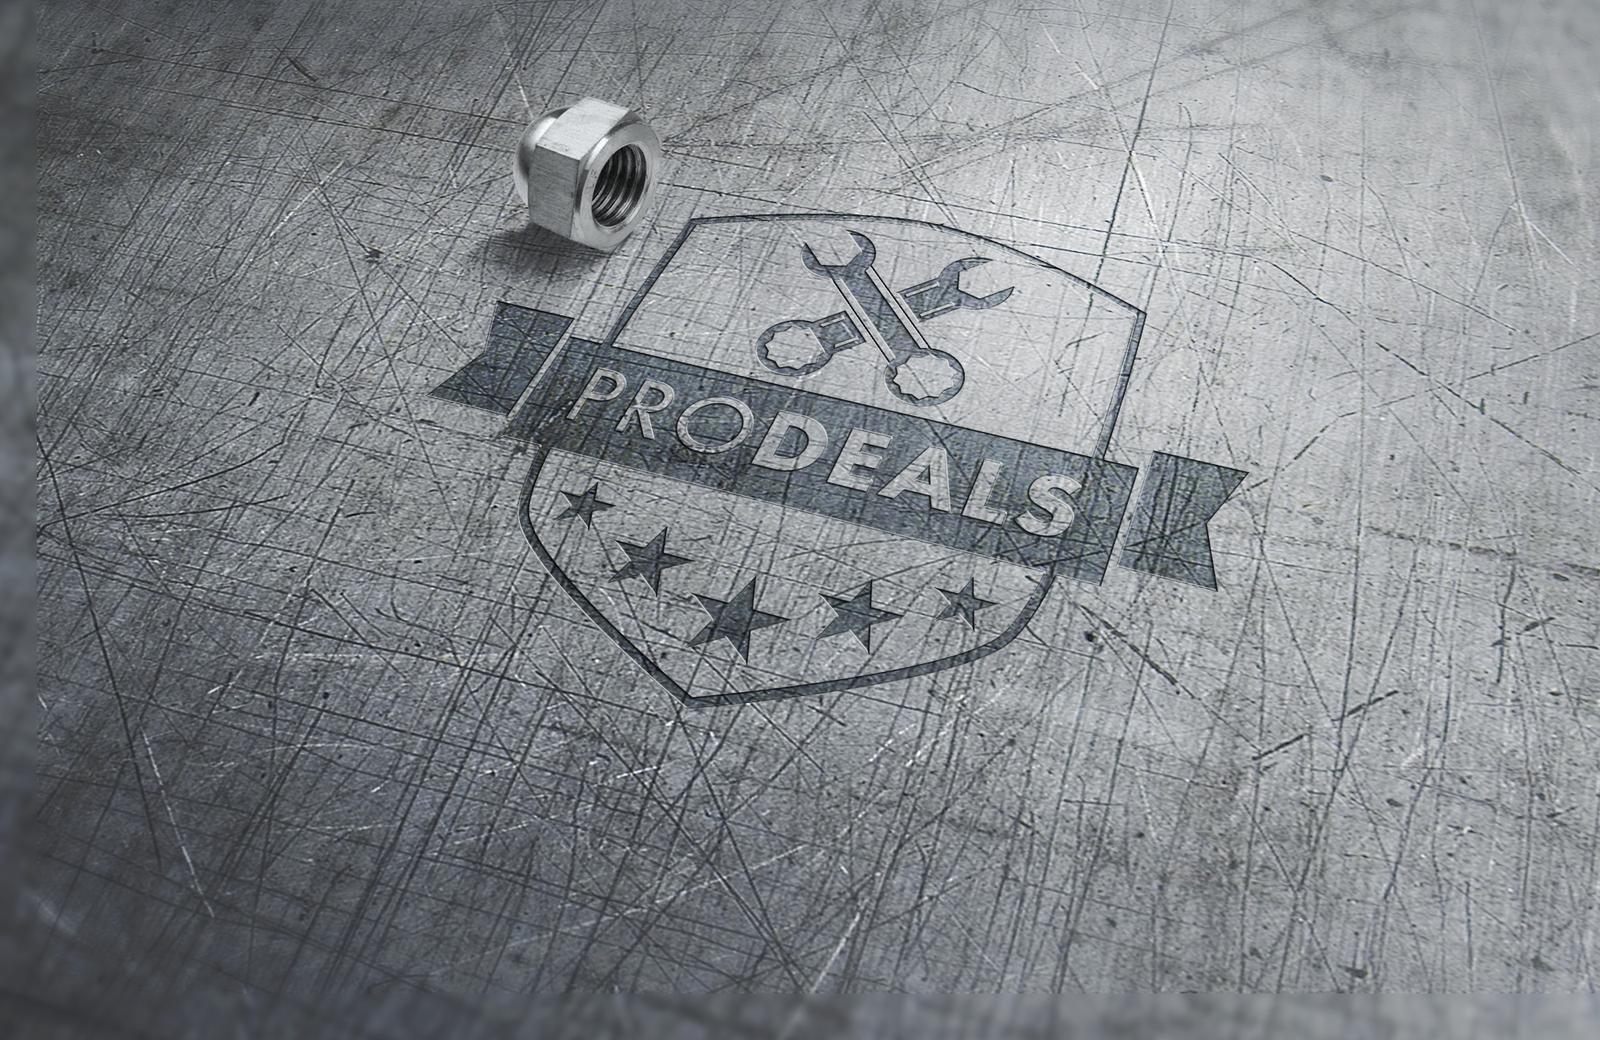 PRODEALSLLC